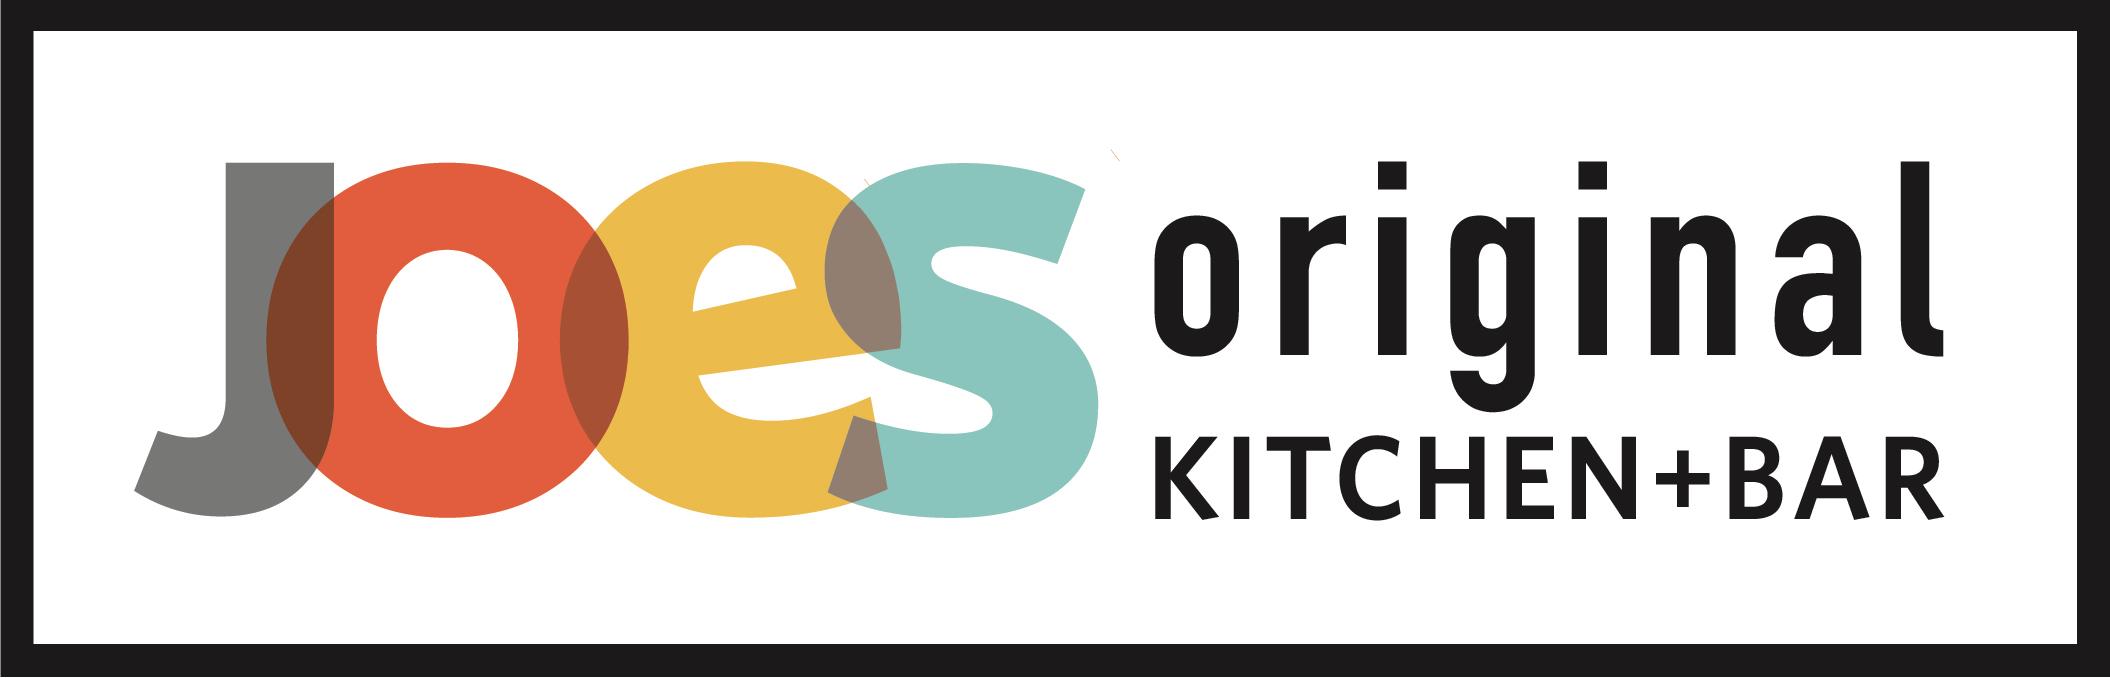 Joe's Original Kitchen + Bar